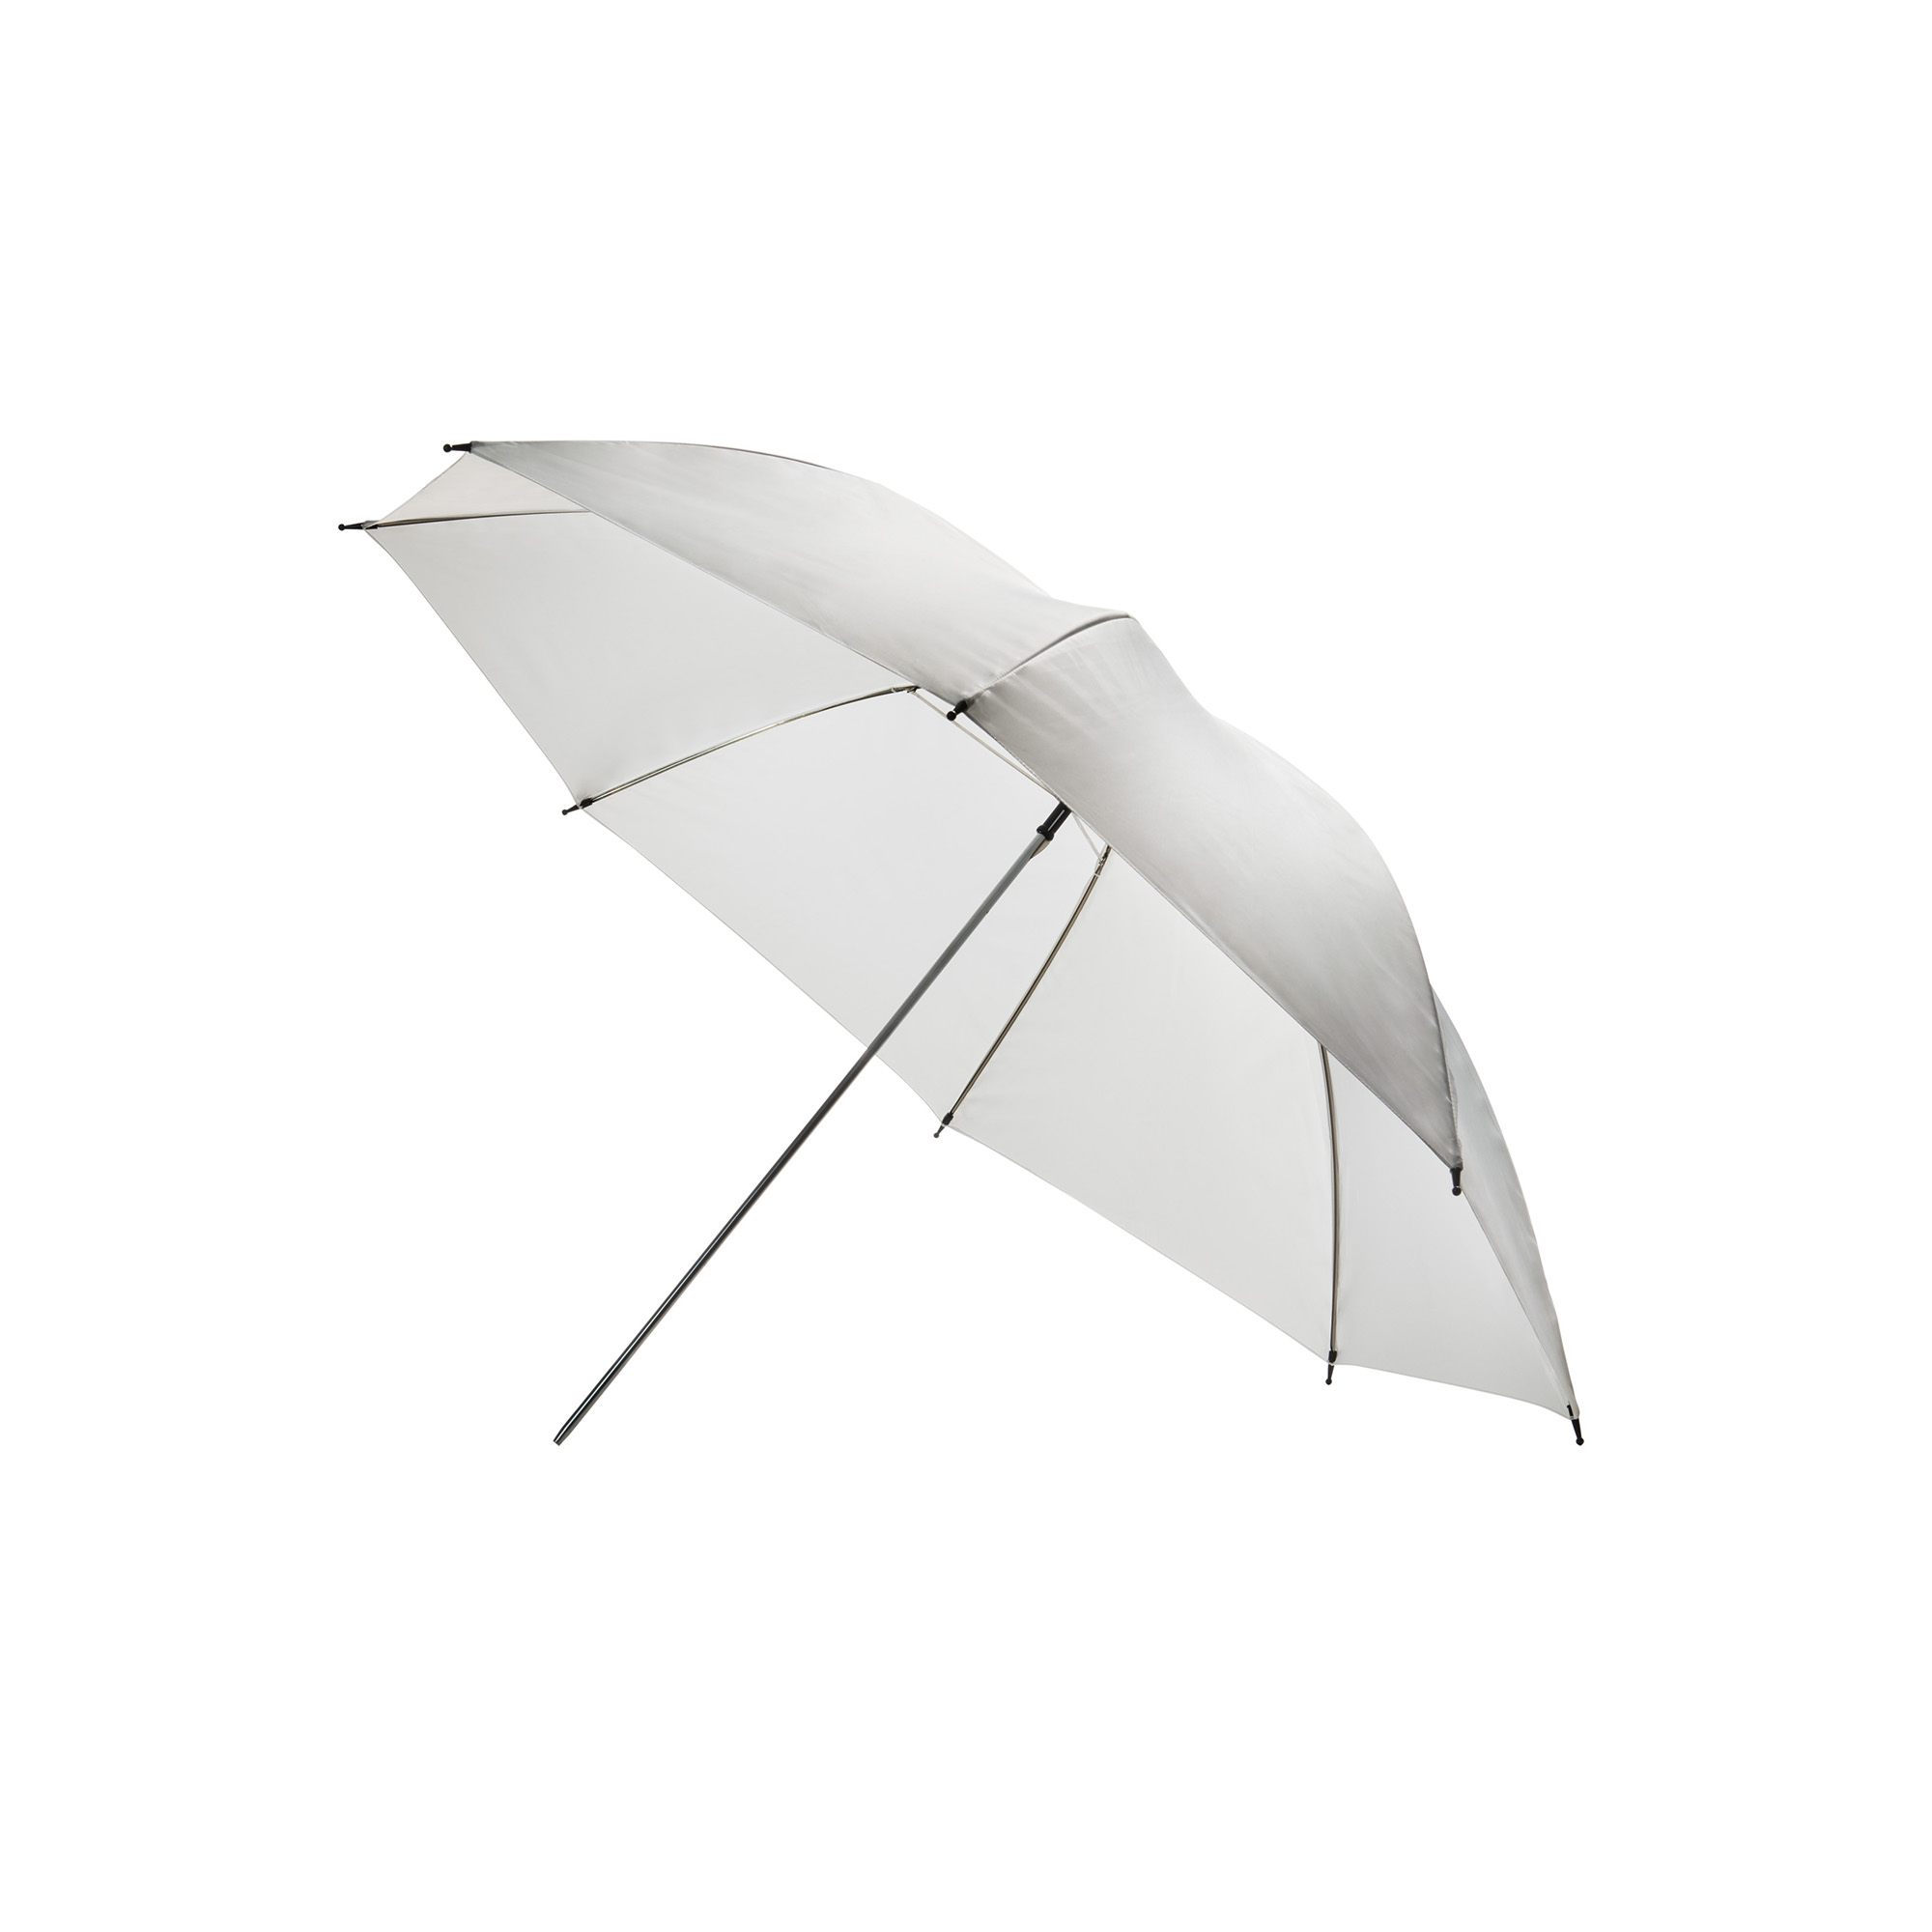 Broncolor Umbrella transparent 105 cm available to rent / verhuur / location at 50.8 Studio • Belgïe, Belgique, Belgium, Broncolor, Huur, Increment, Location, Louer, Photo, Rent, Rental, Softbox, Strobe, Studio, Verhuur, Video